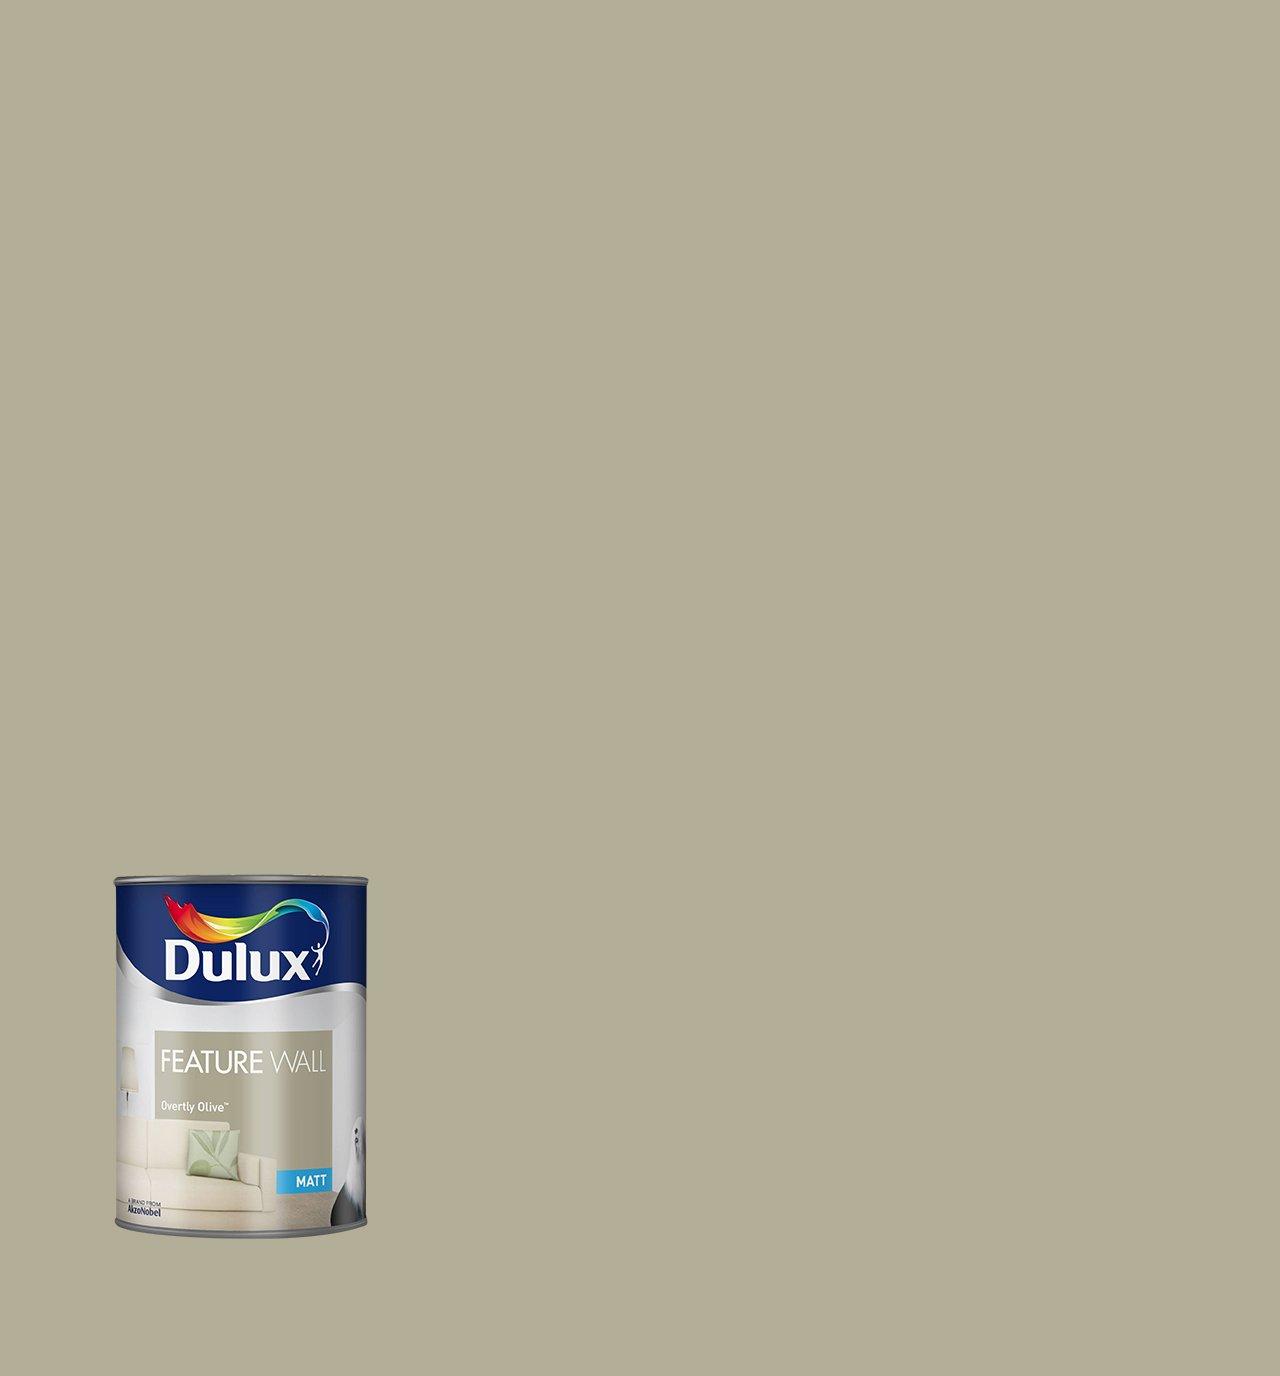 Dulux Matt Paint For Walls Feature 1.25 L